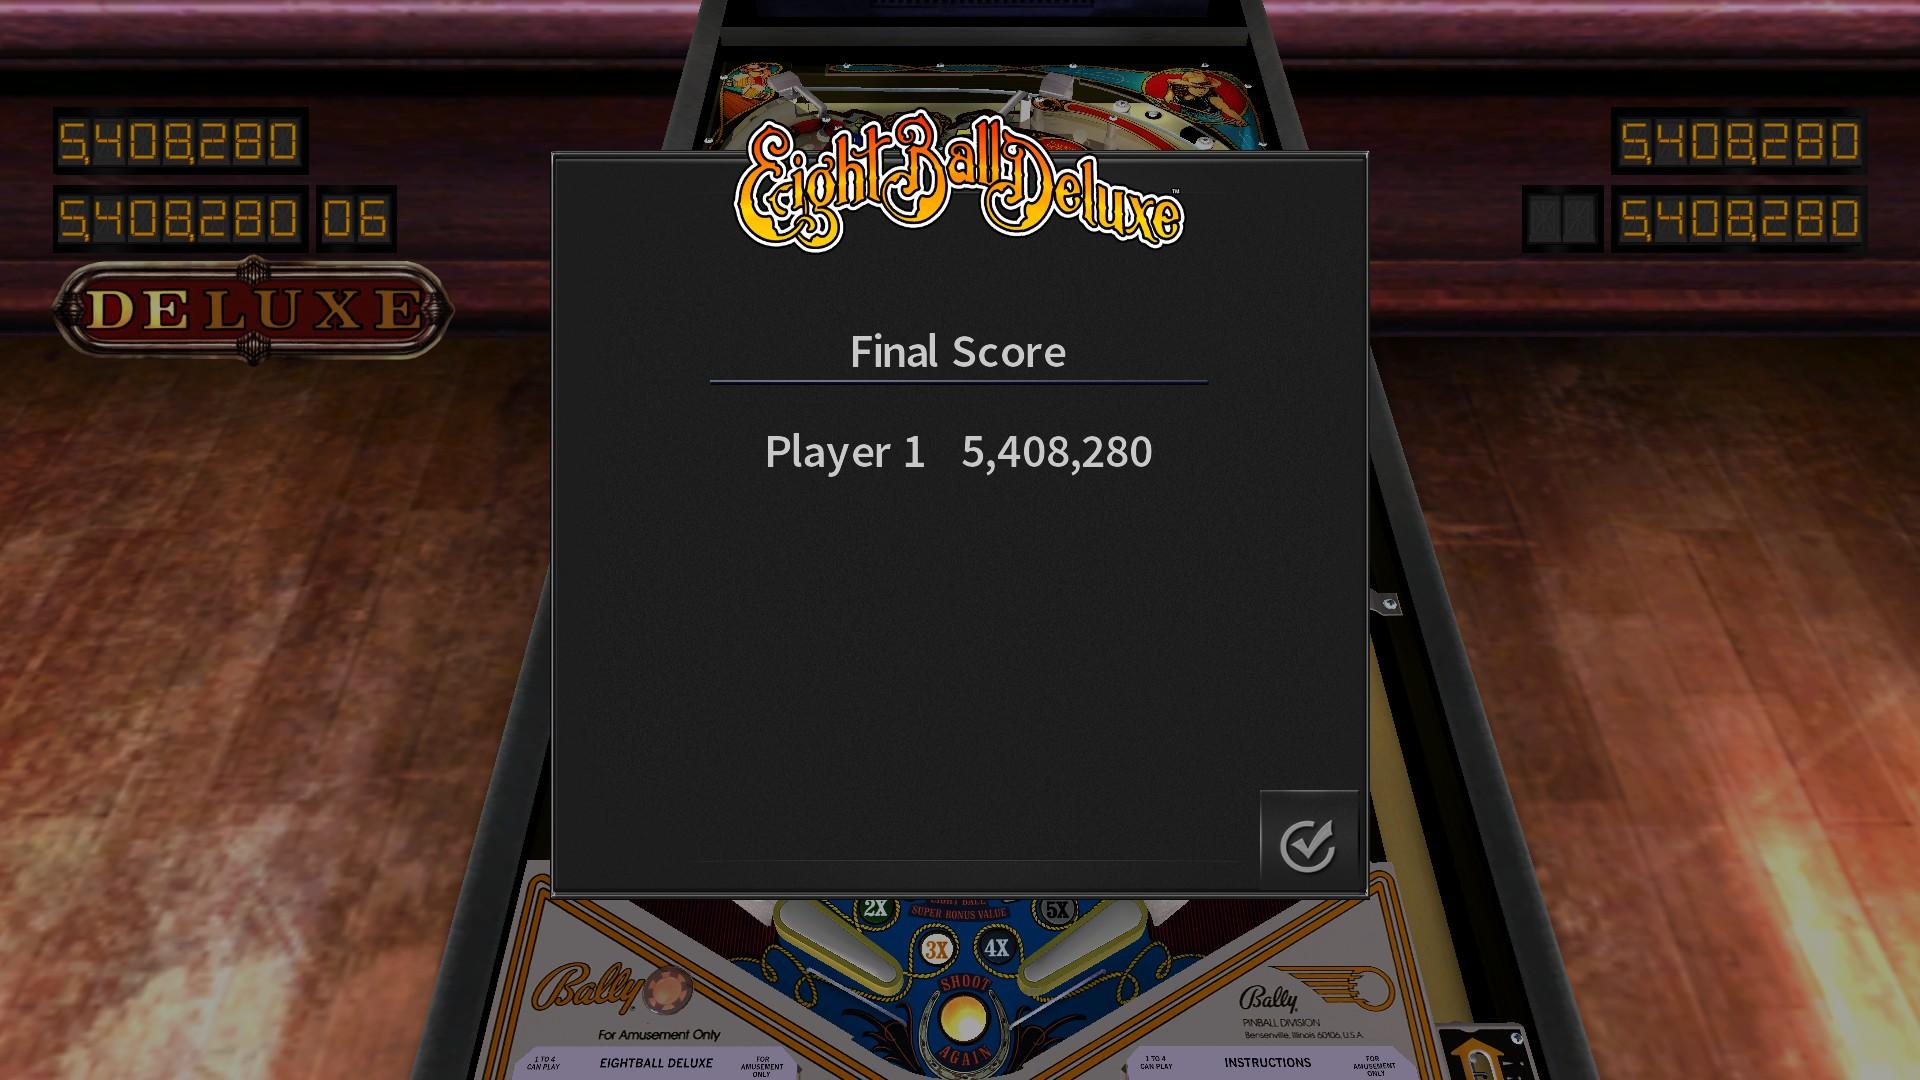 Pinball Arcade: Eight Ball Deluxe 5,408,280 points